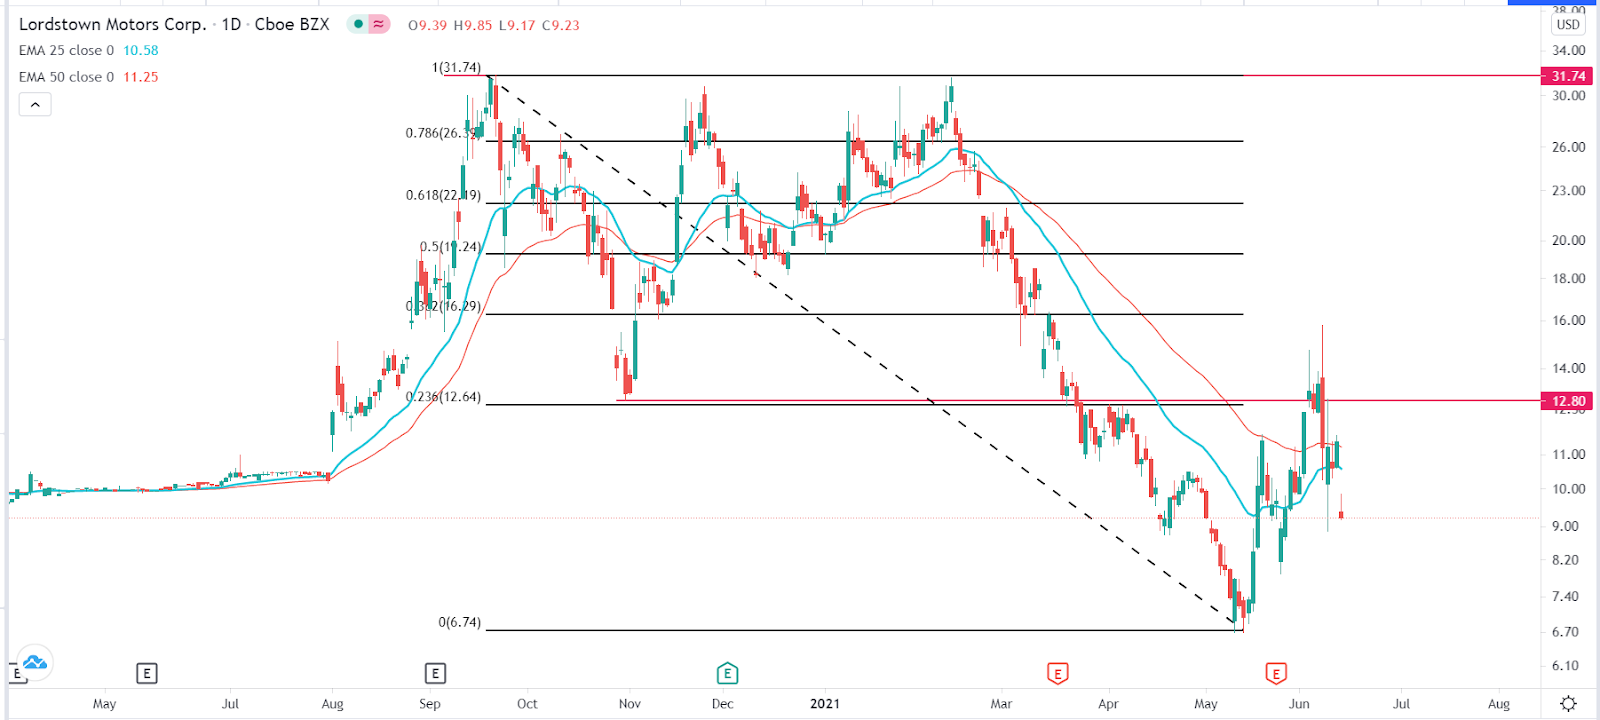 RIDE stock price